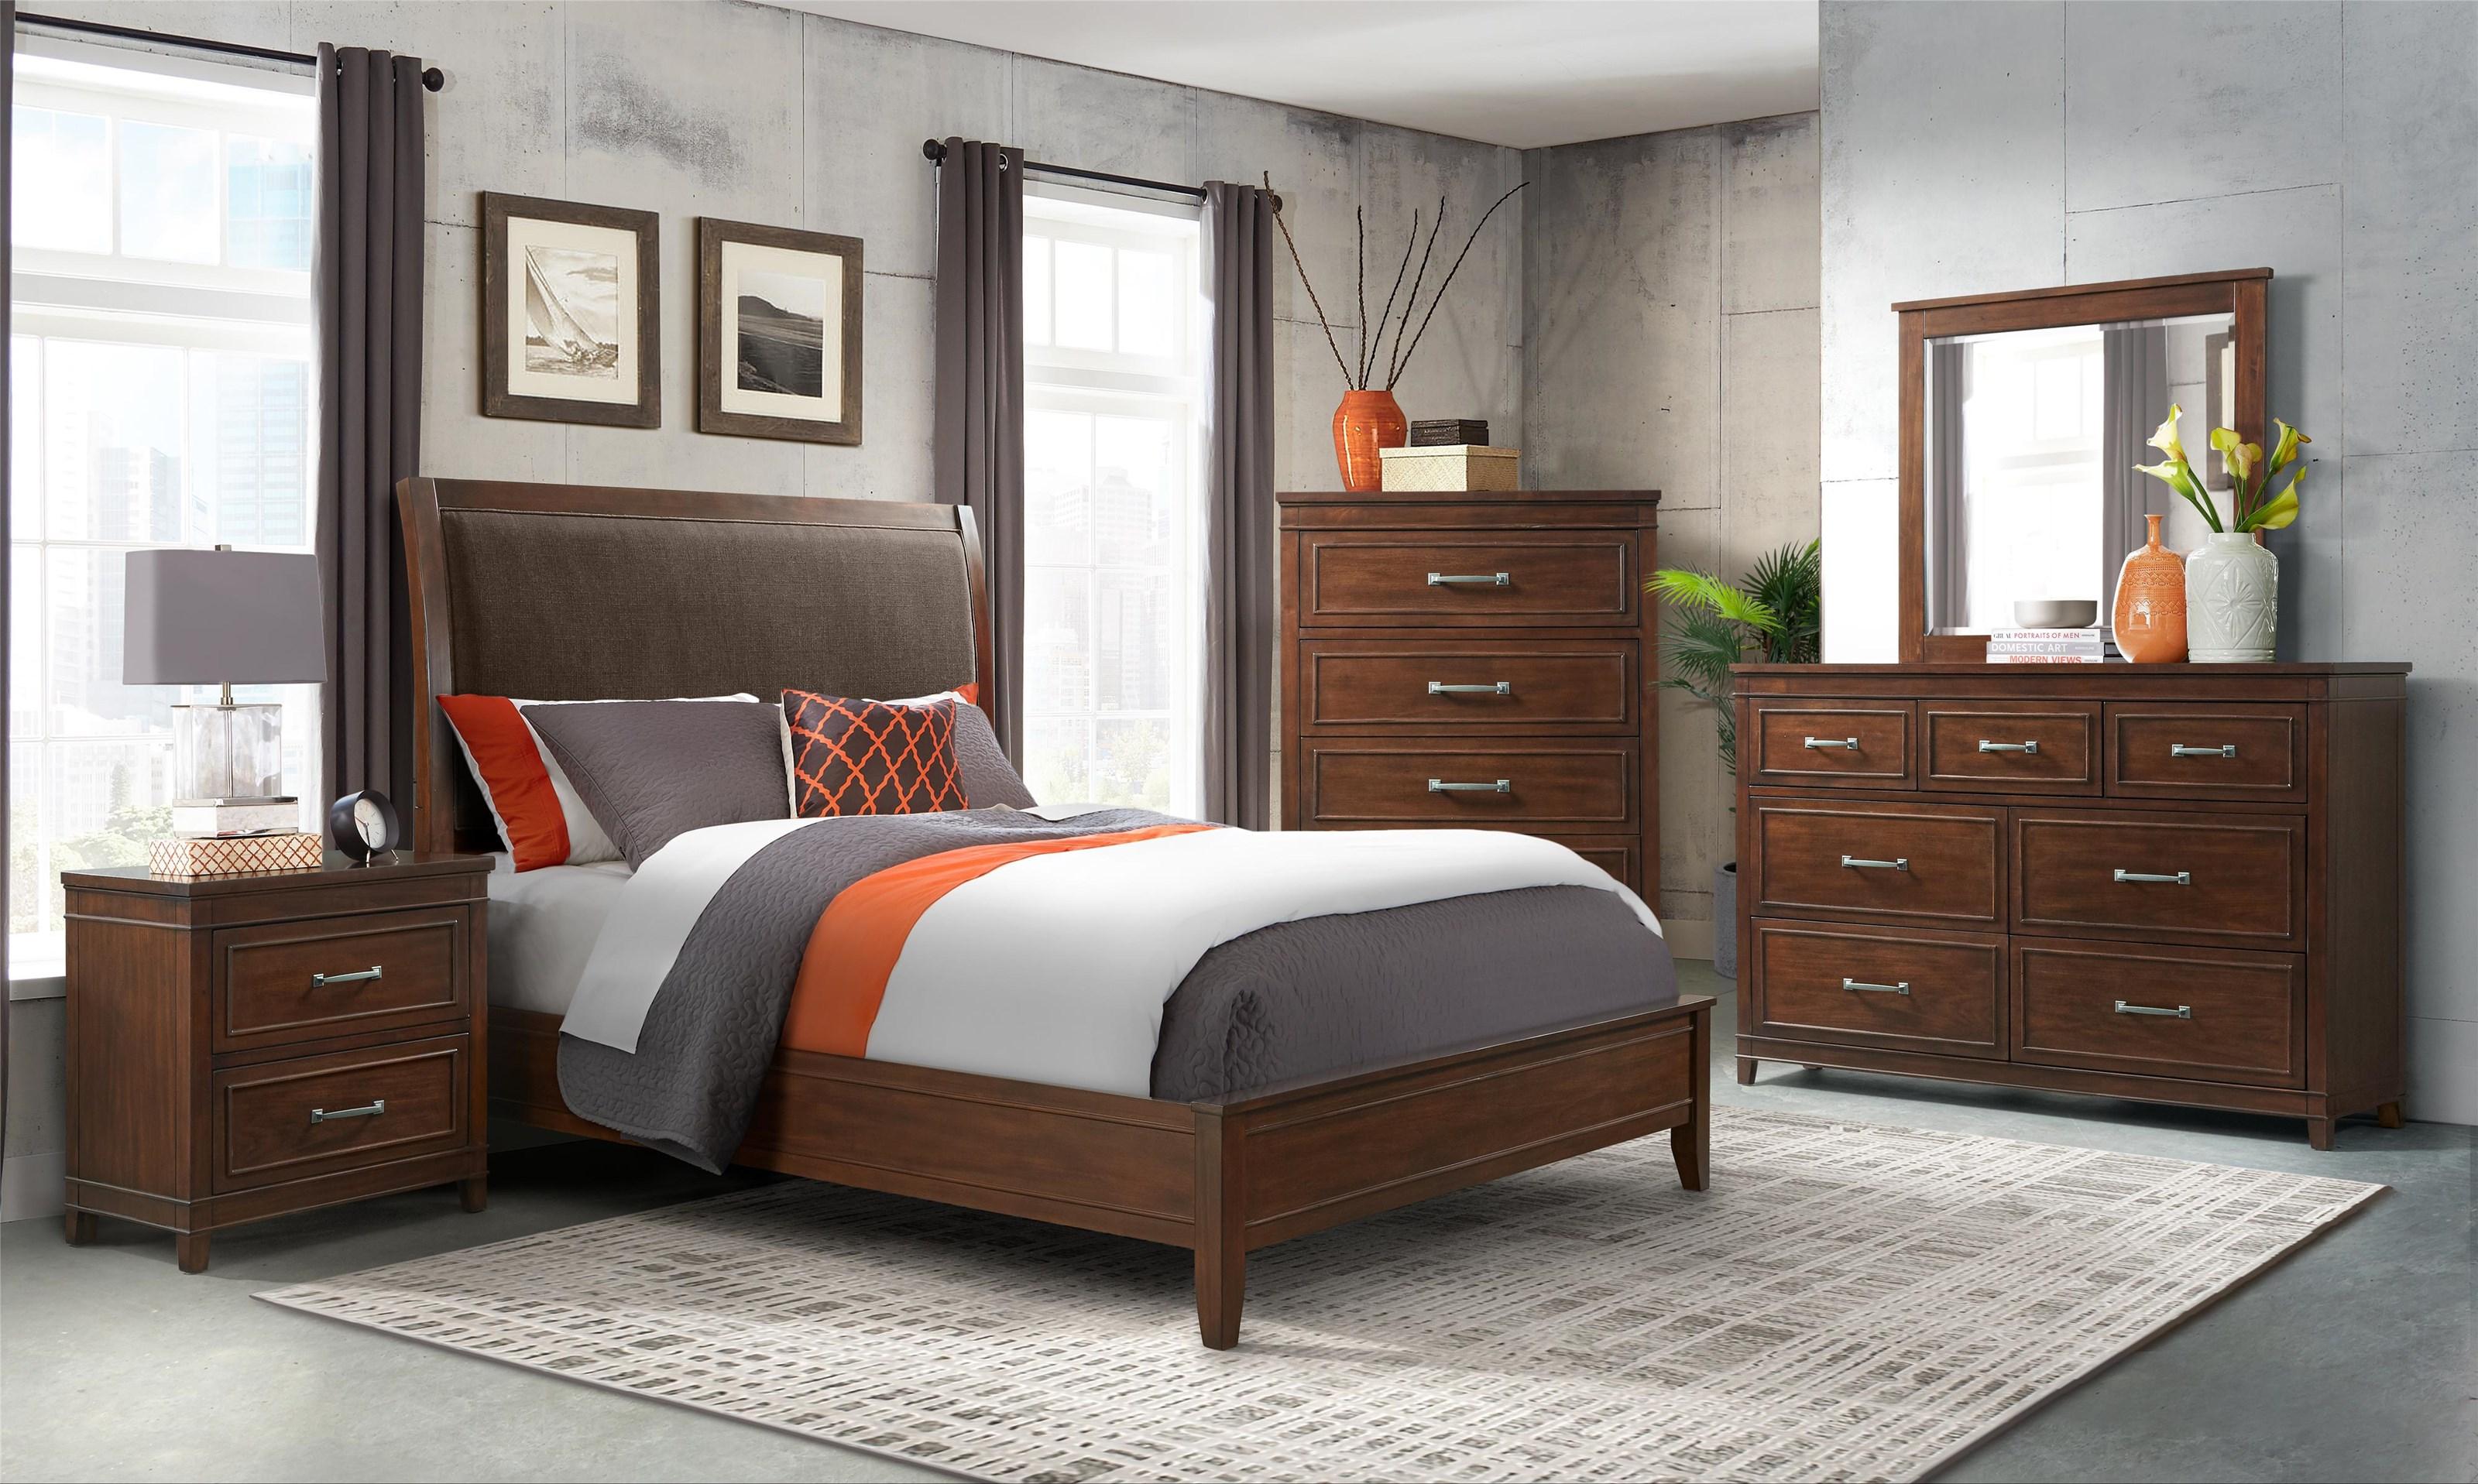 Martin Svensson Home Lajolla King Size Bed Darvin Furniture Panel Beds